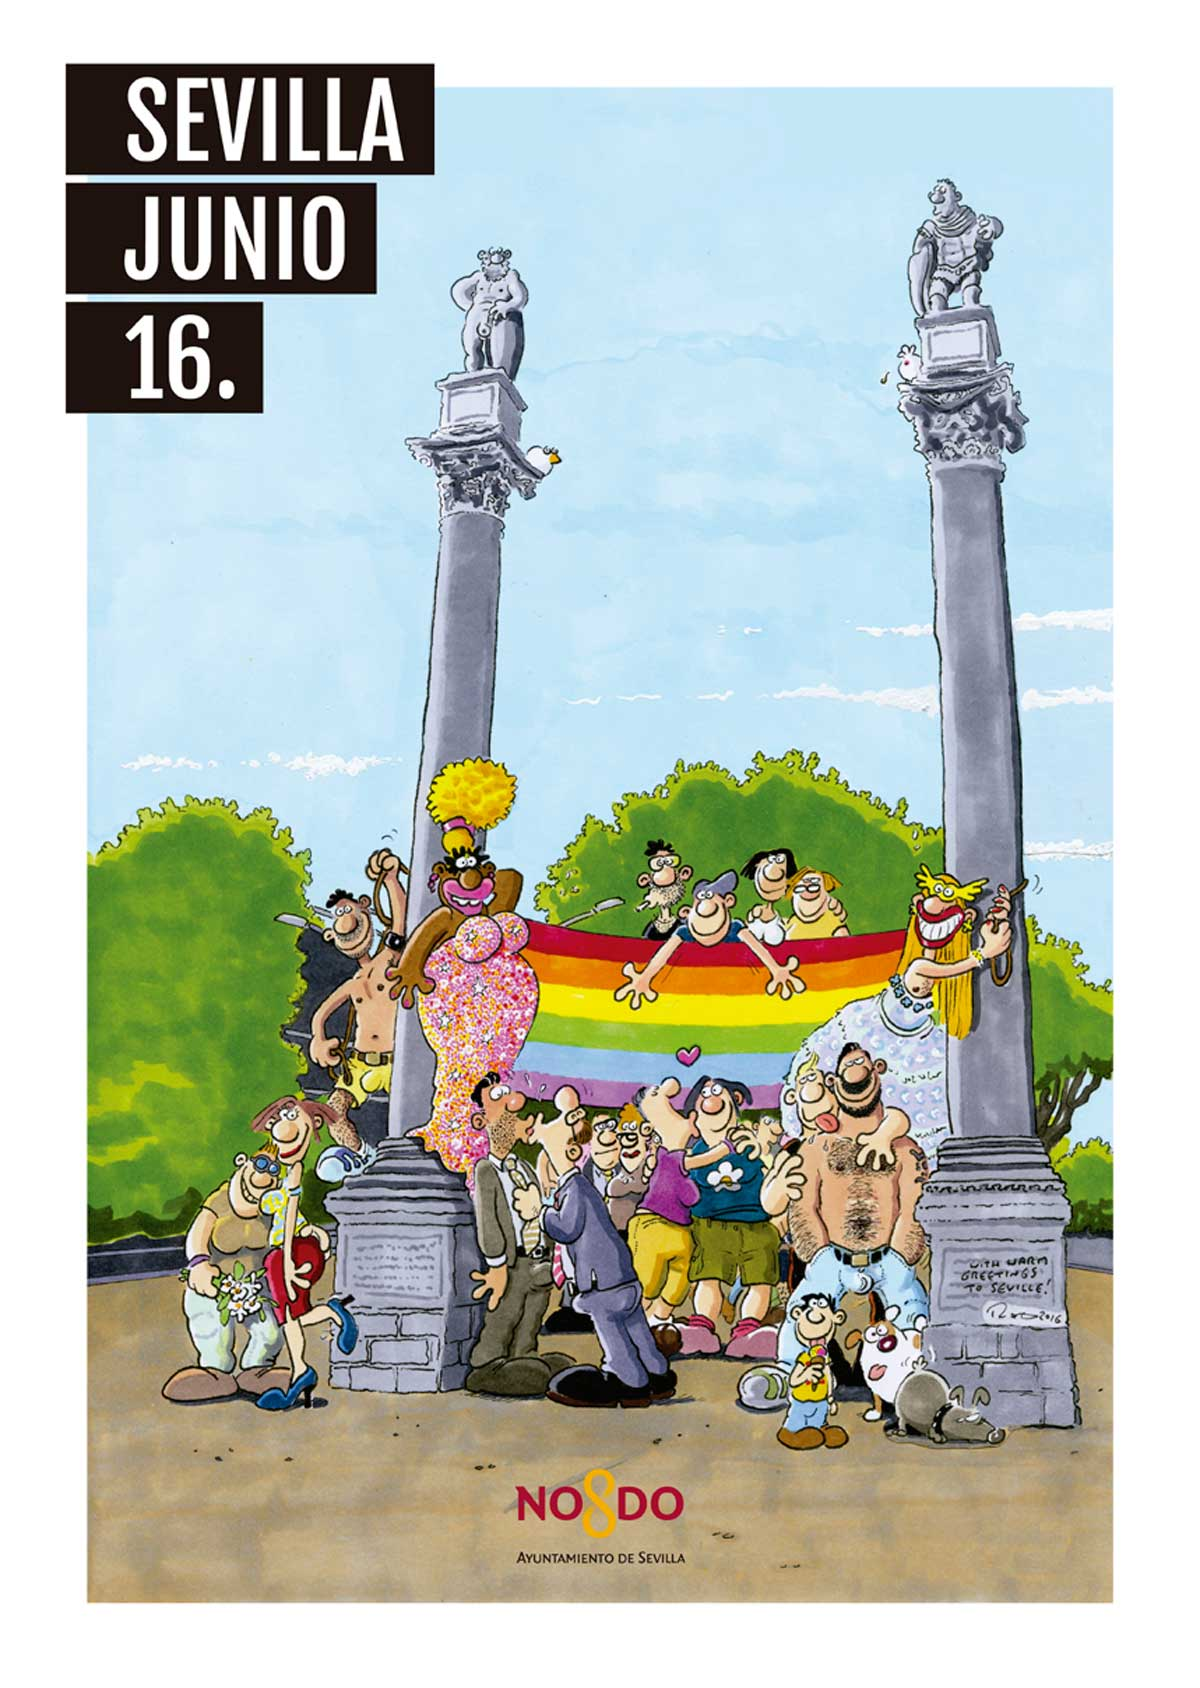 Programas de actividades para celebrar el Orgullo LGTBI 2016